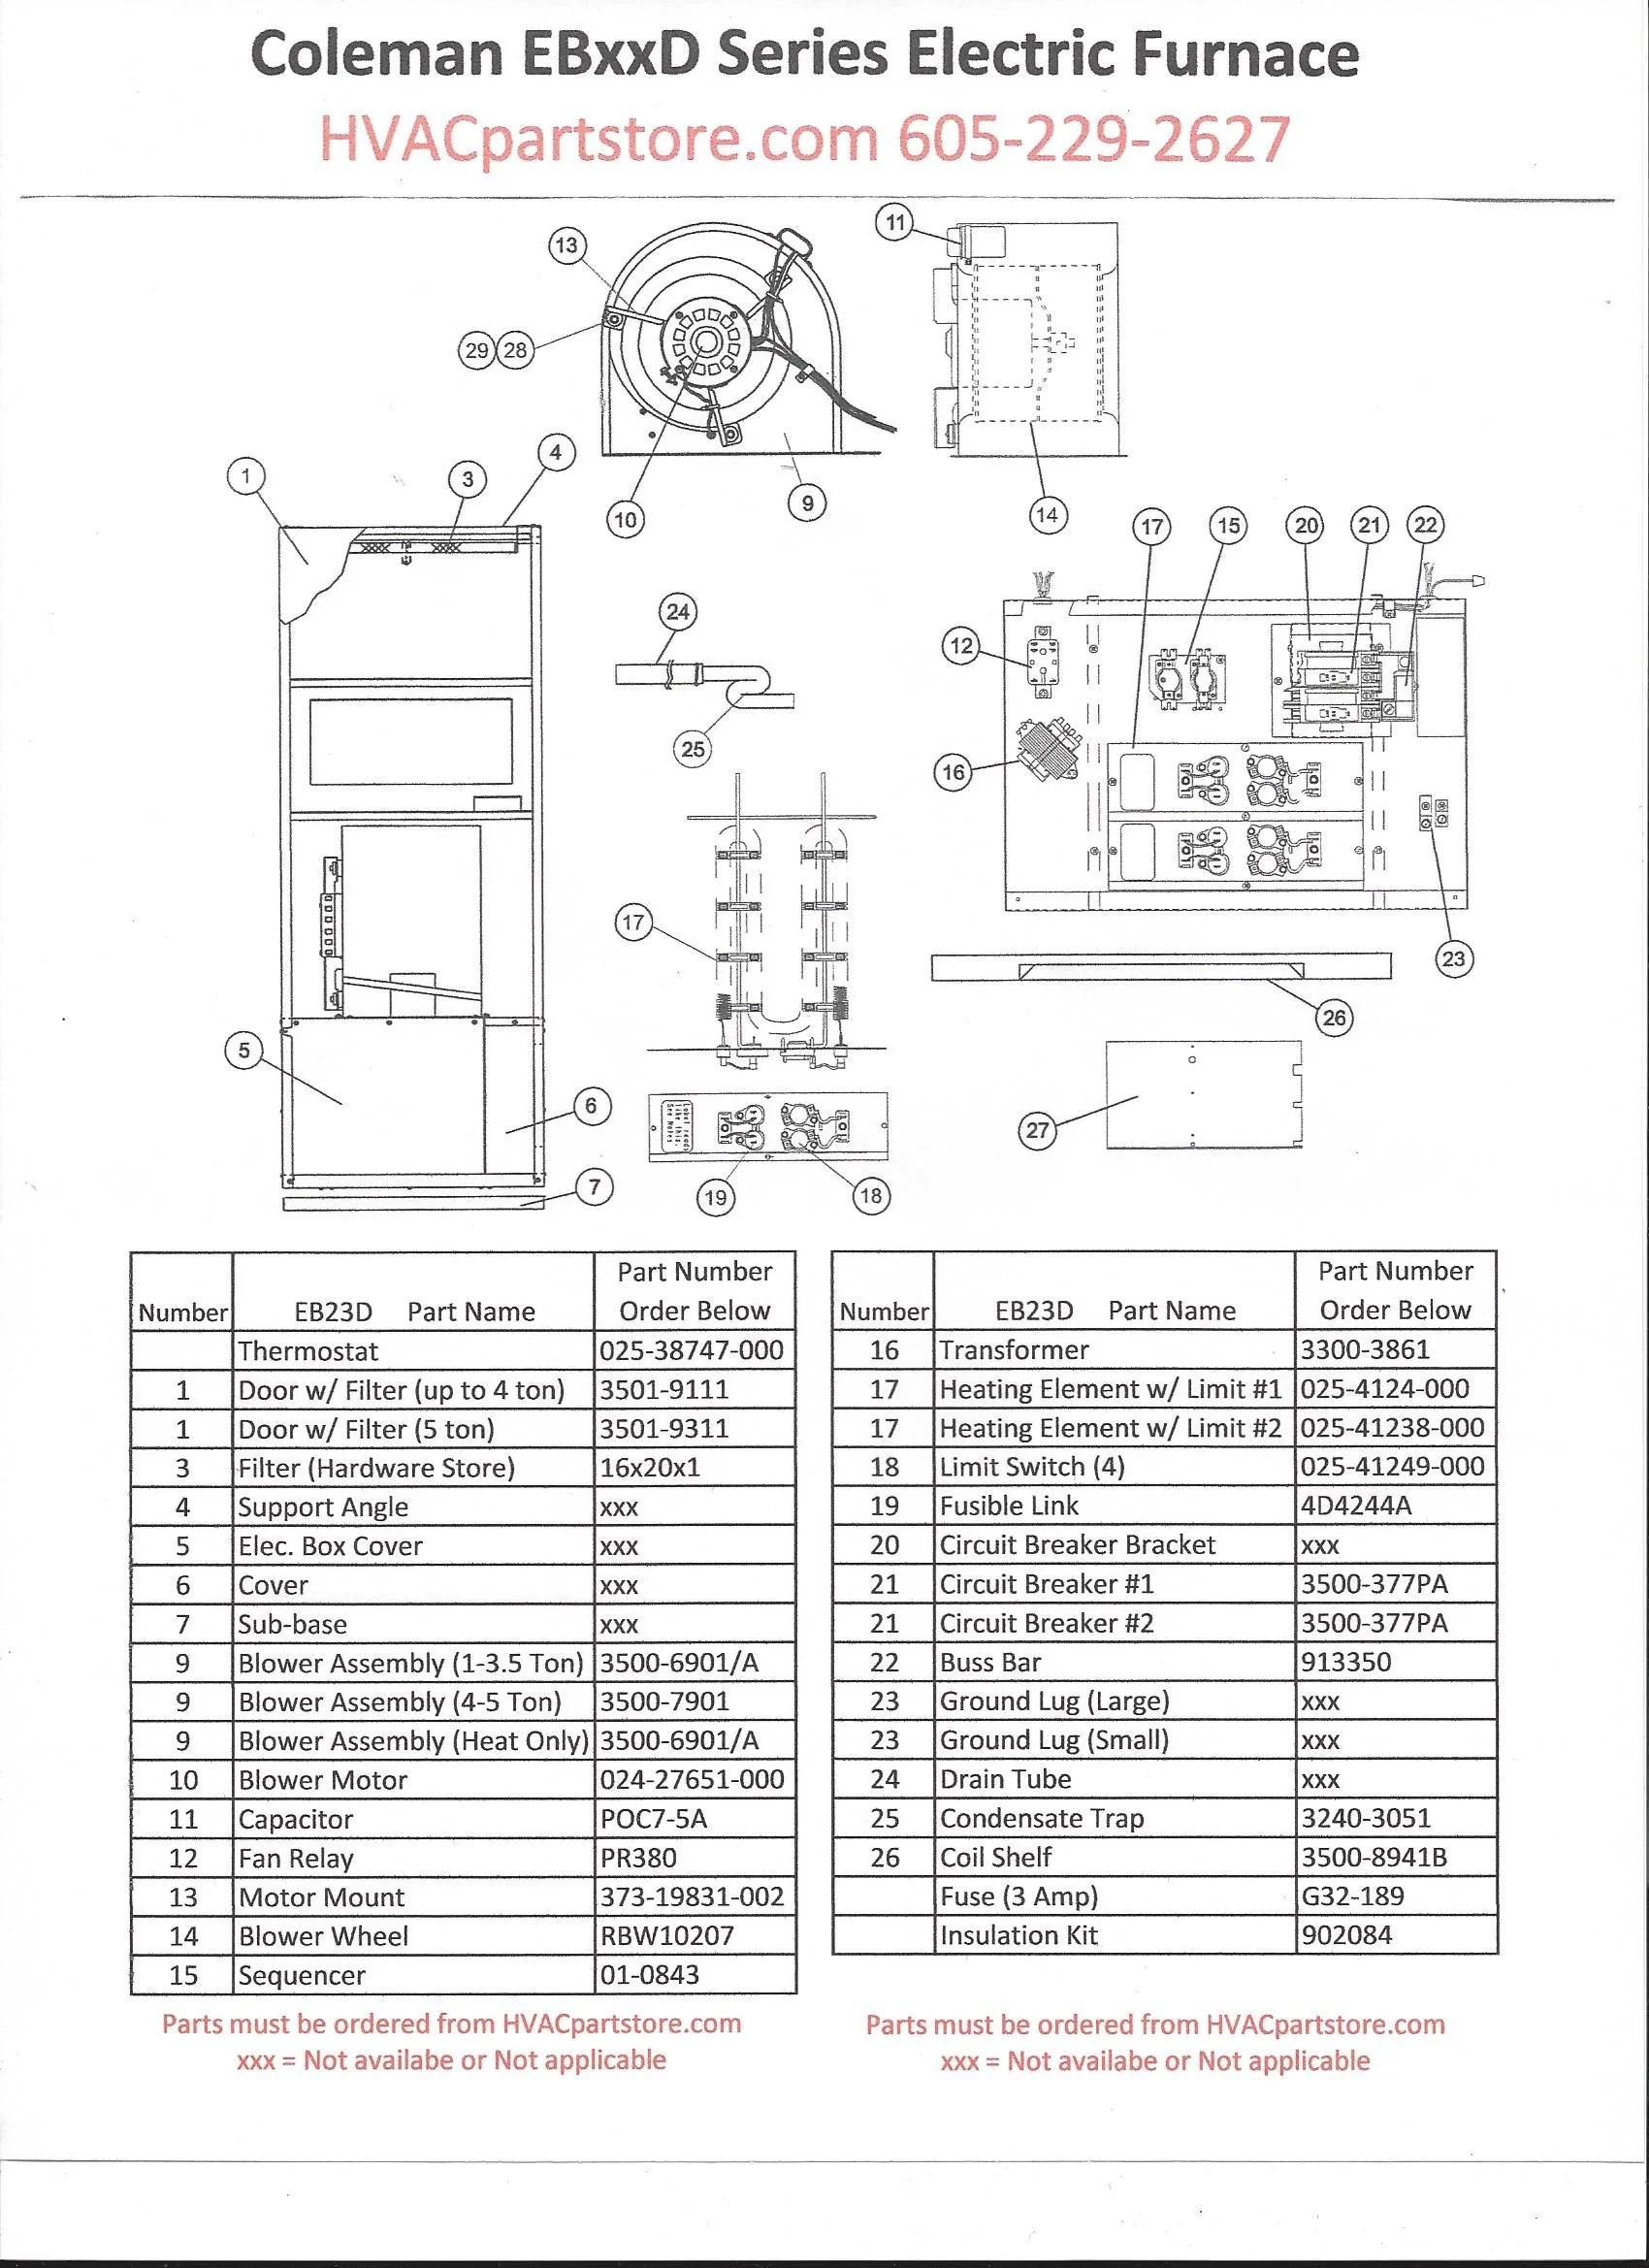 tempstar air conditioner wiring diagrams plumbing plan for a house Lennox Furnace Parts Diagram  Nordyne Heat Pump Wiring Diagram Ducane Furnace Parts Heil Furnace Wiring Diagram